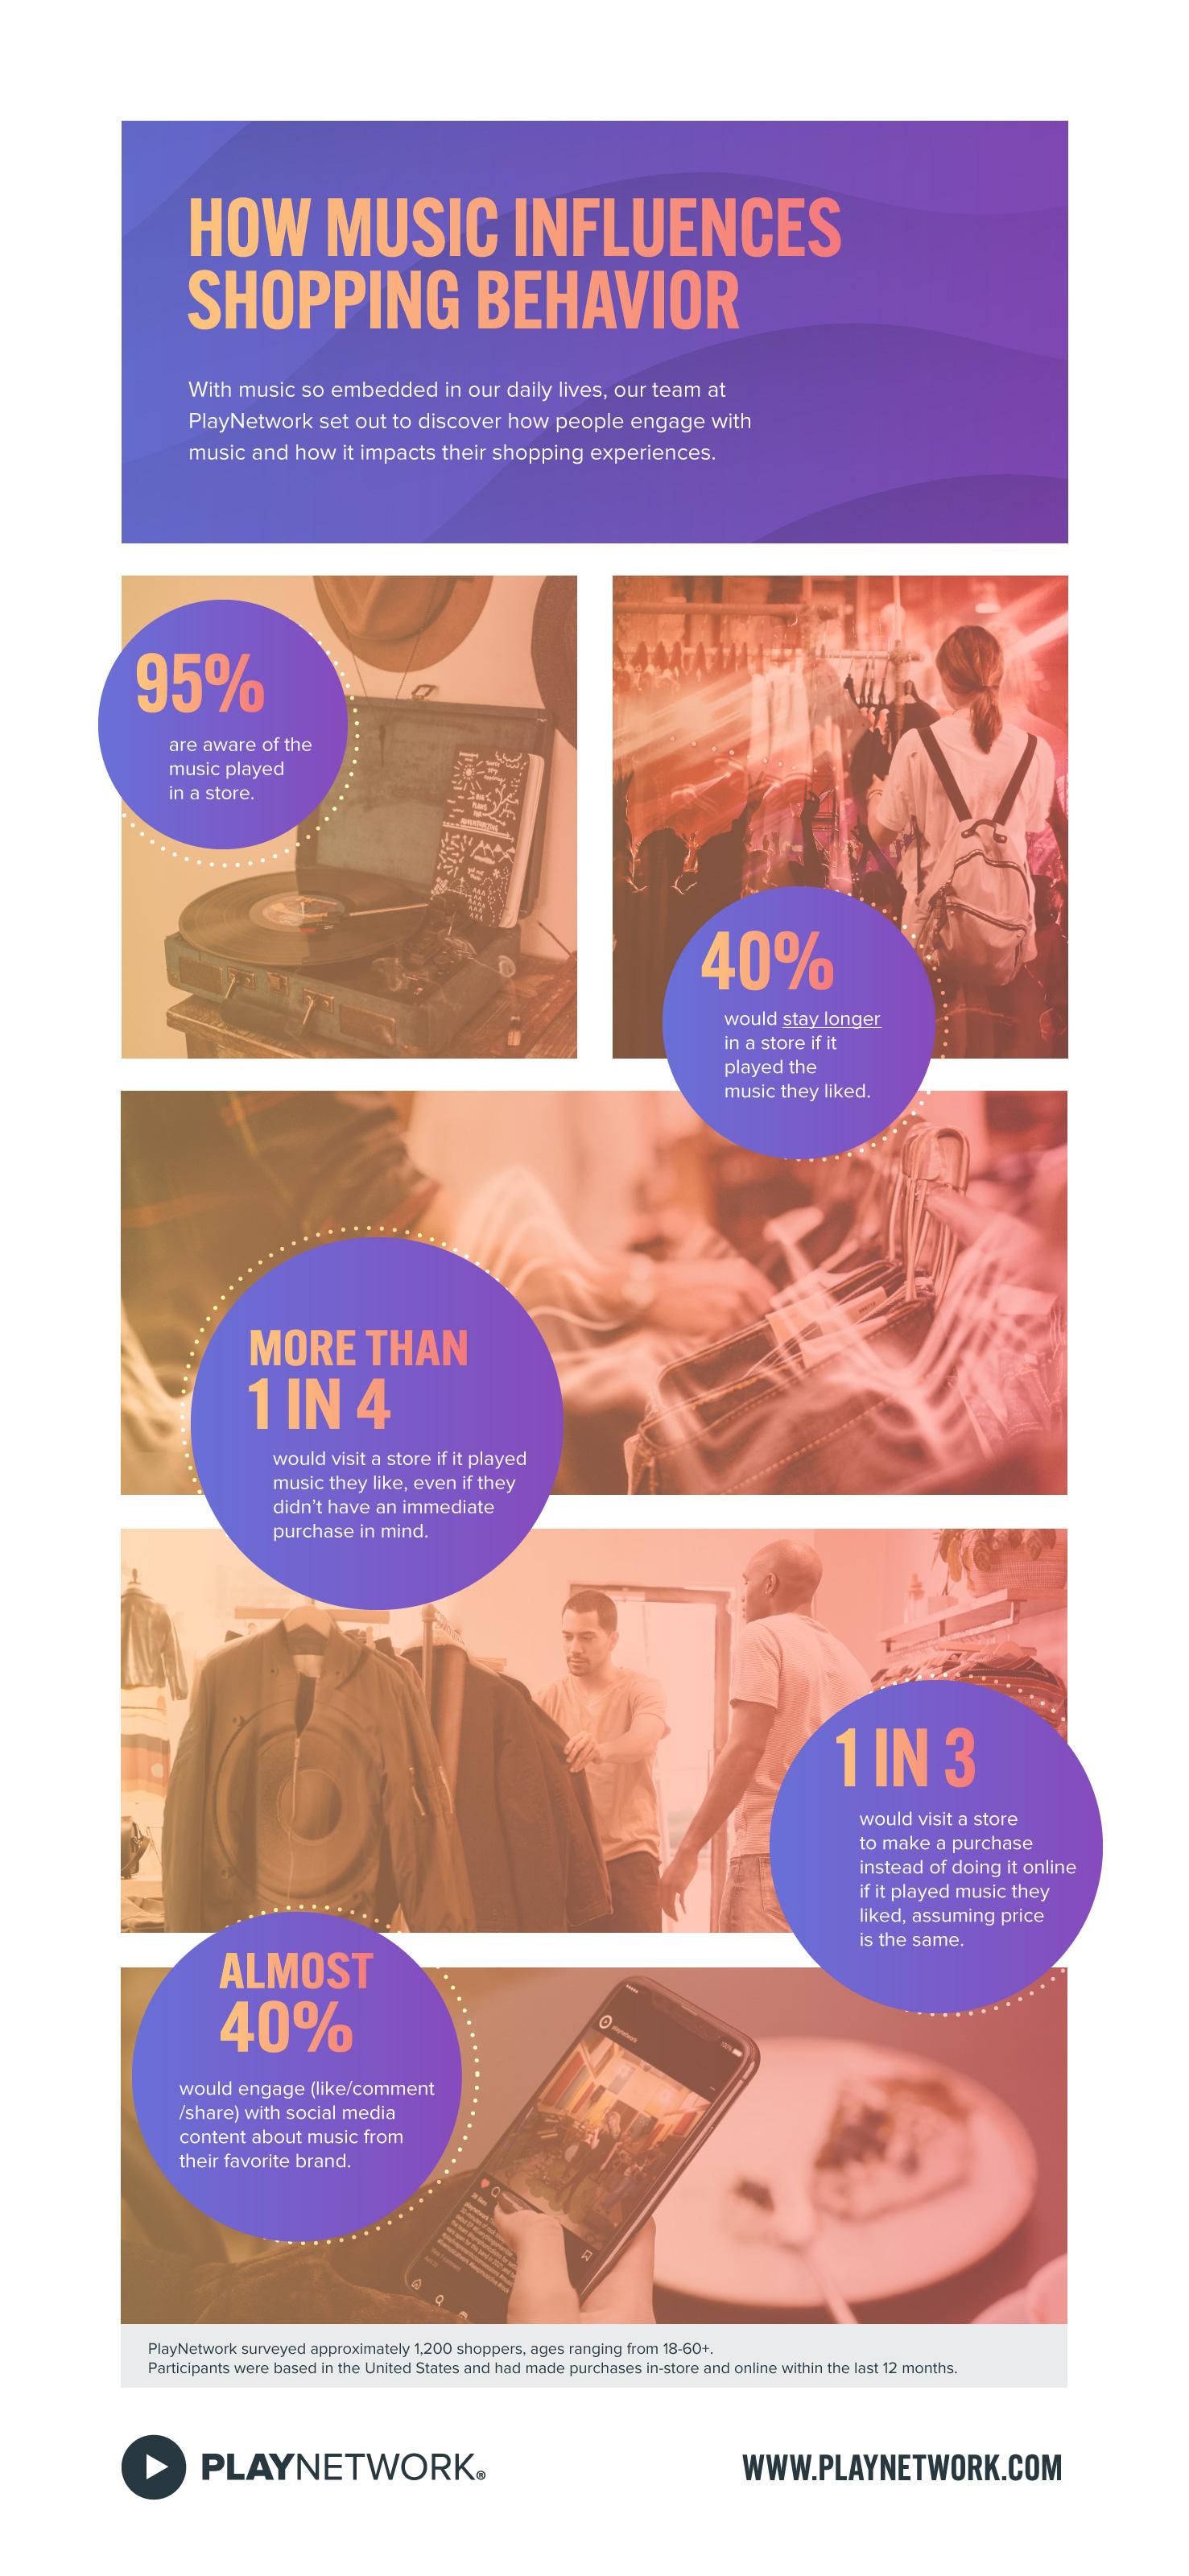 How Music Influences Shopping Behavior